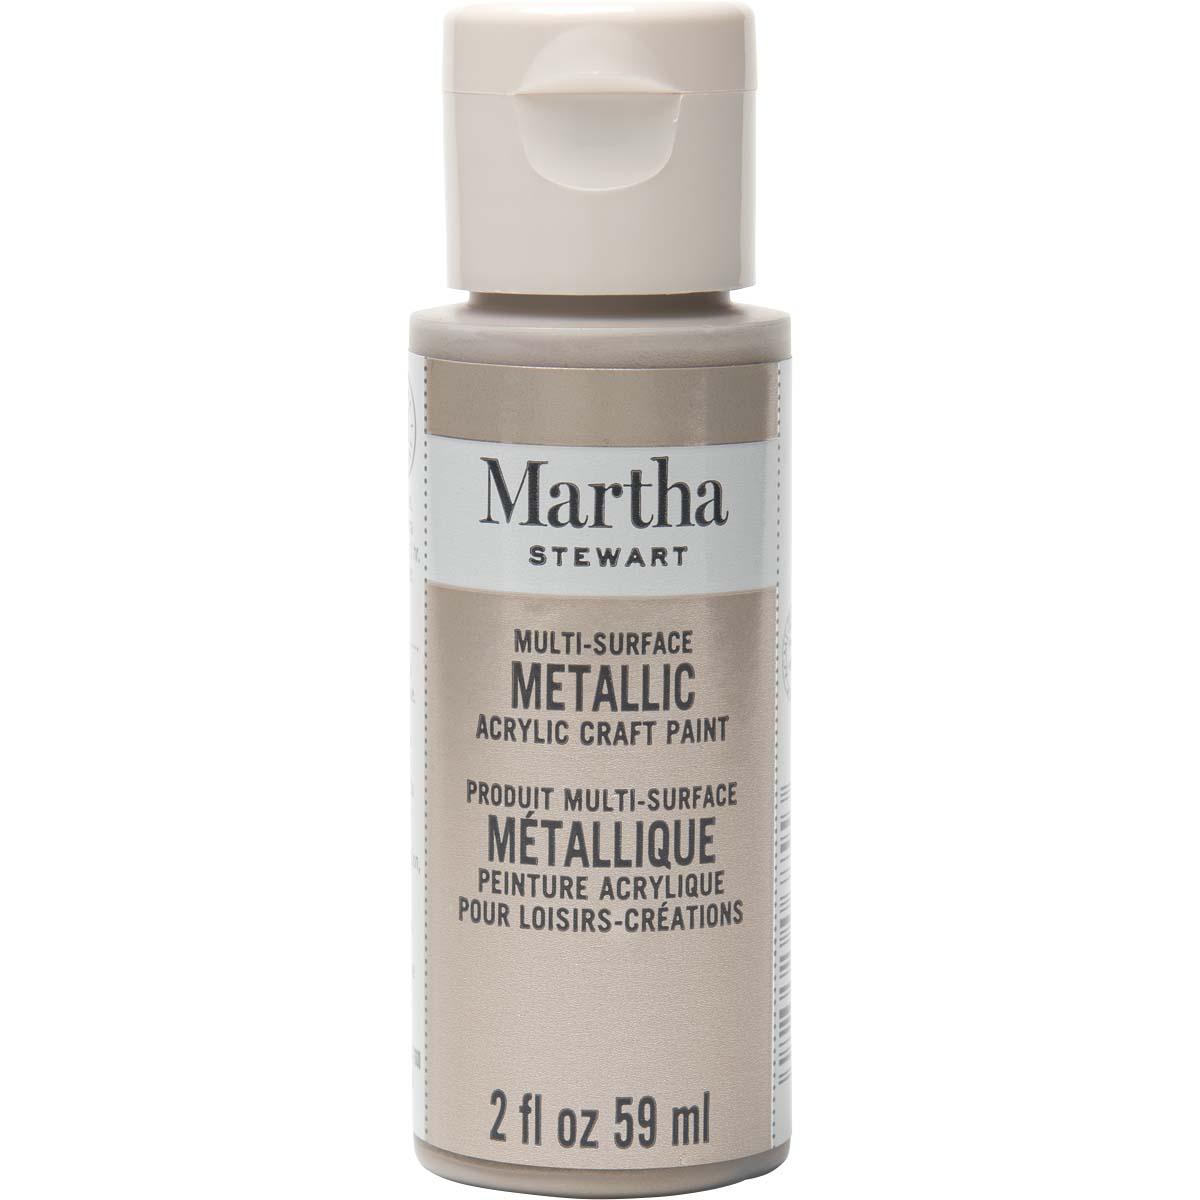 Martha Stewart ® Multi-Surface Metallic Acrylic Craft Paint - Champagne, 2 oz. - 32994CA